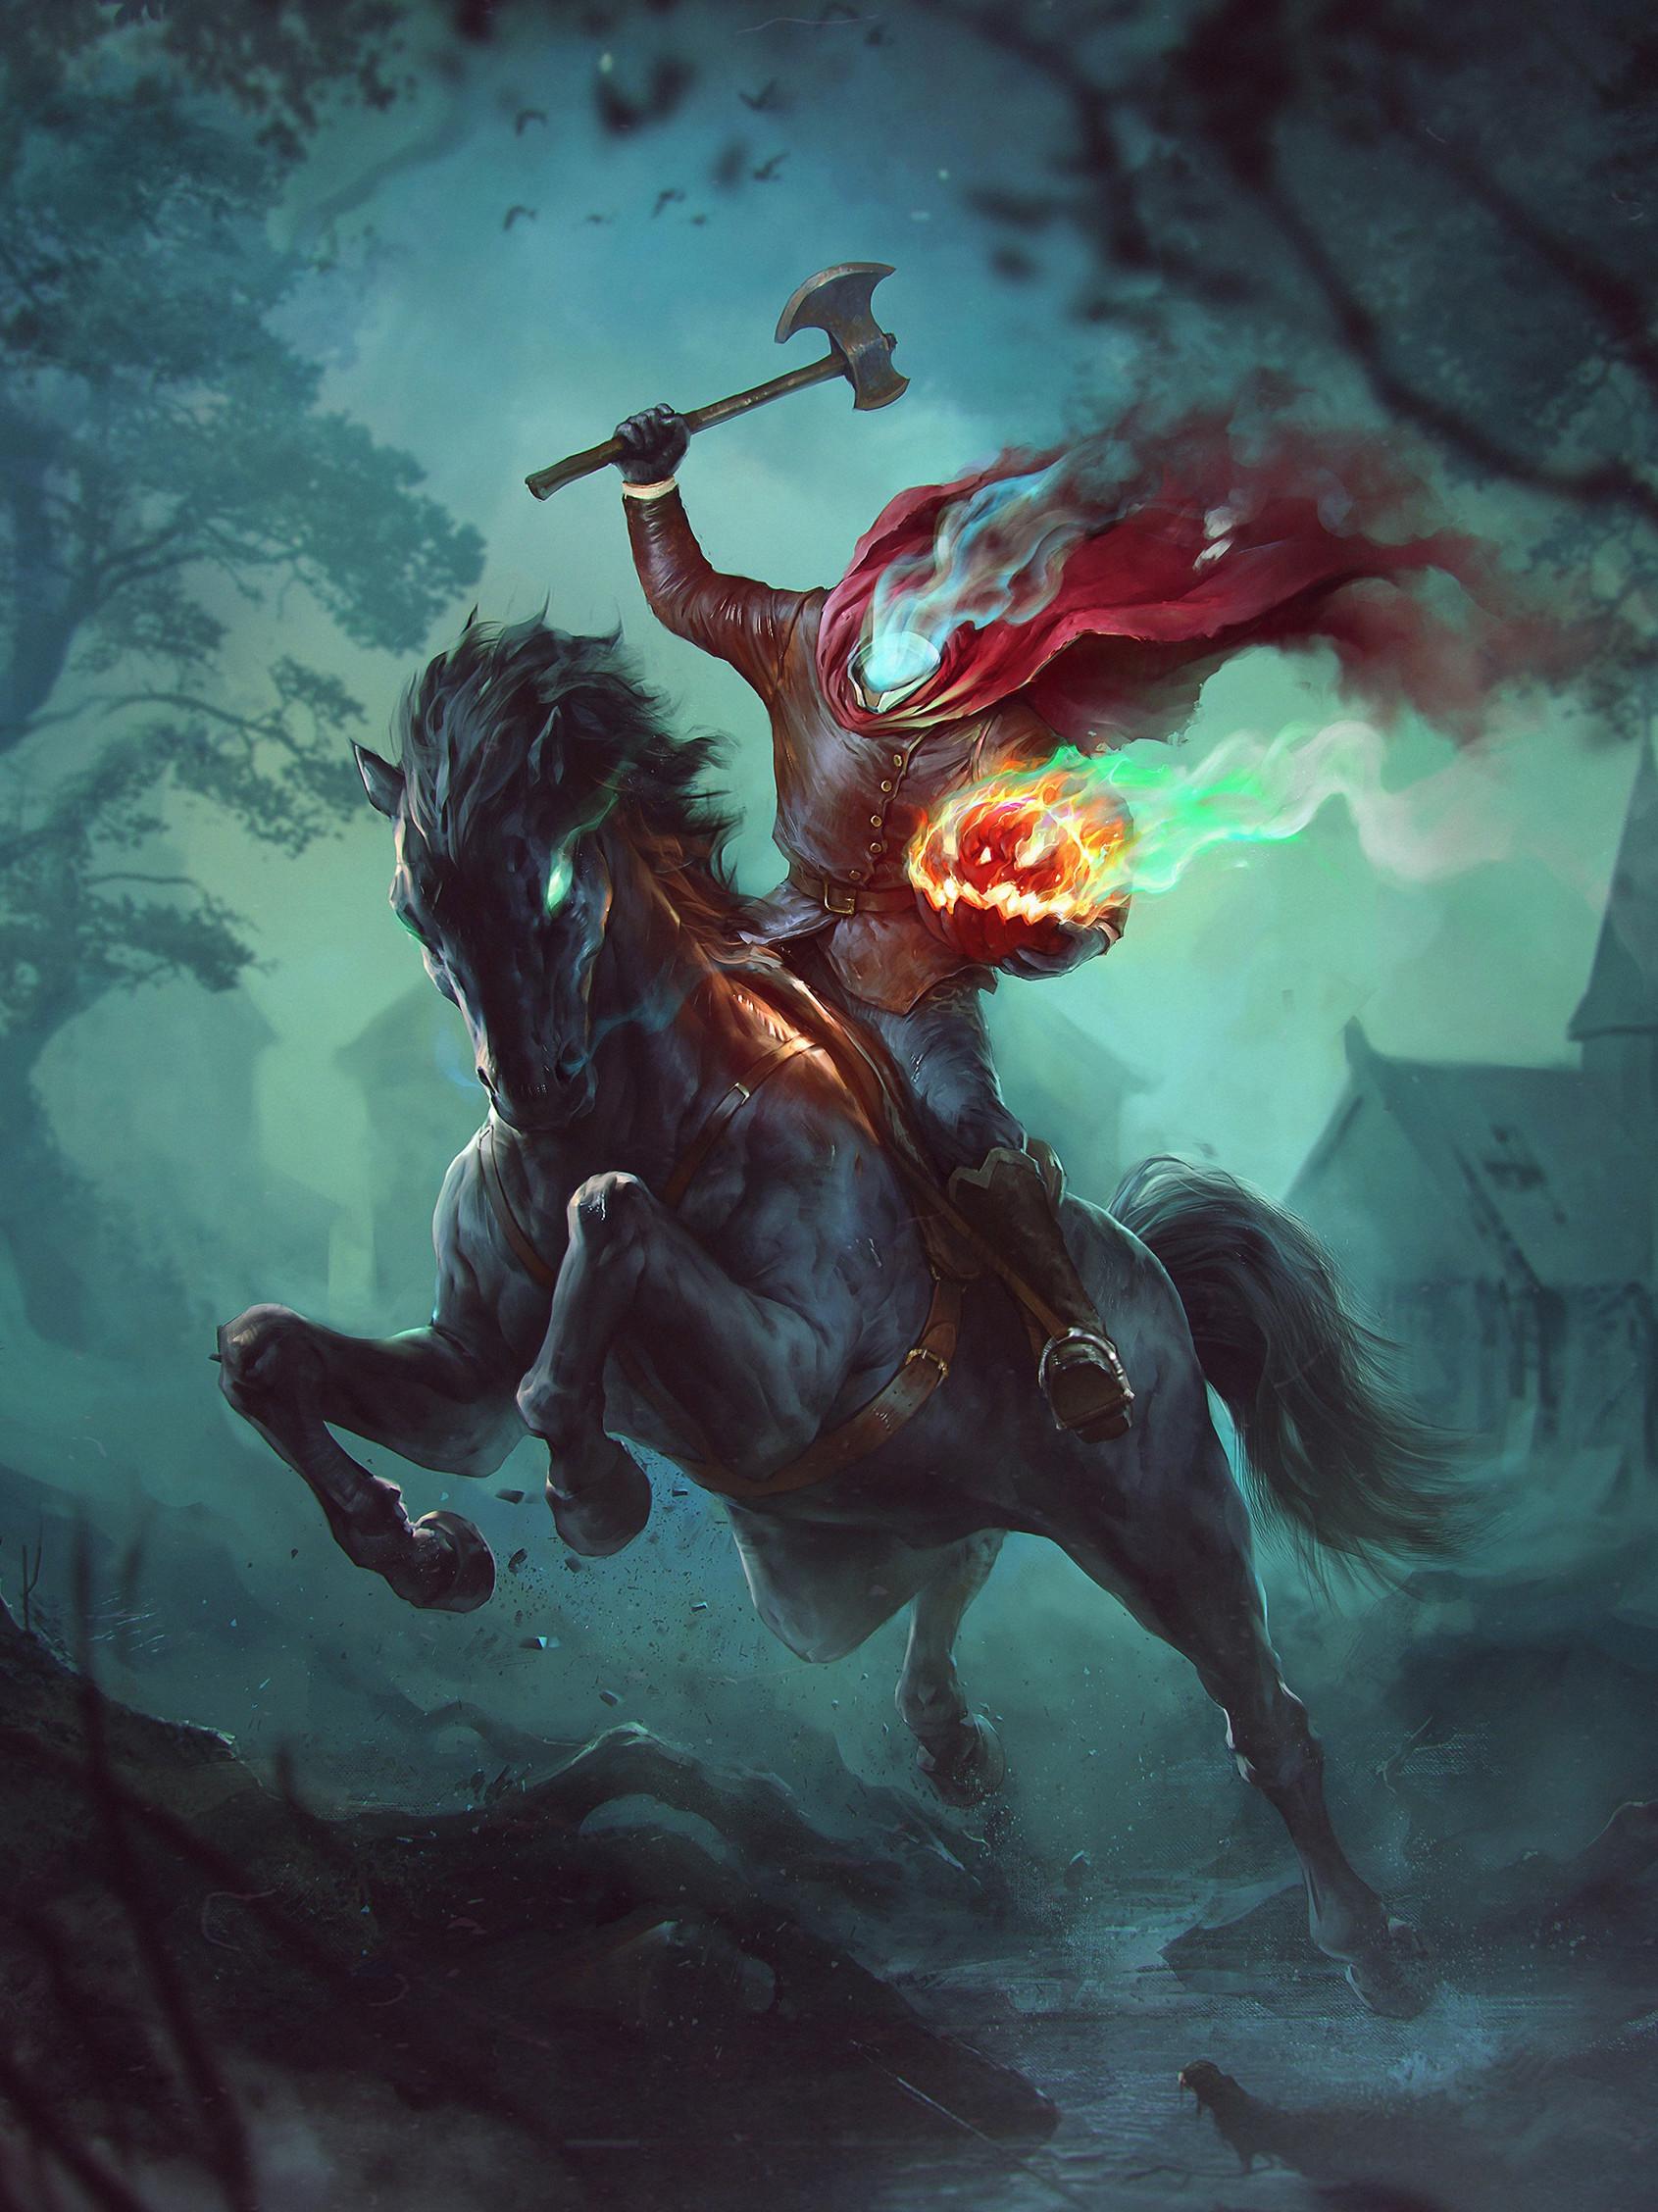 Denys tsiperko headless horseman - Pictures of the headless horseman ...